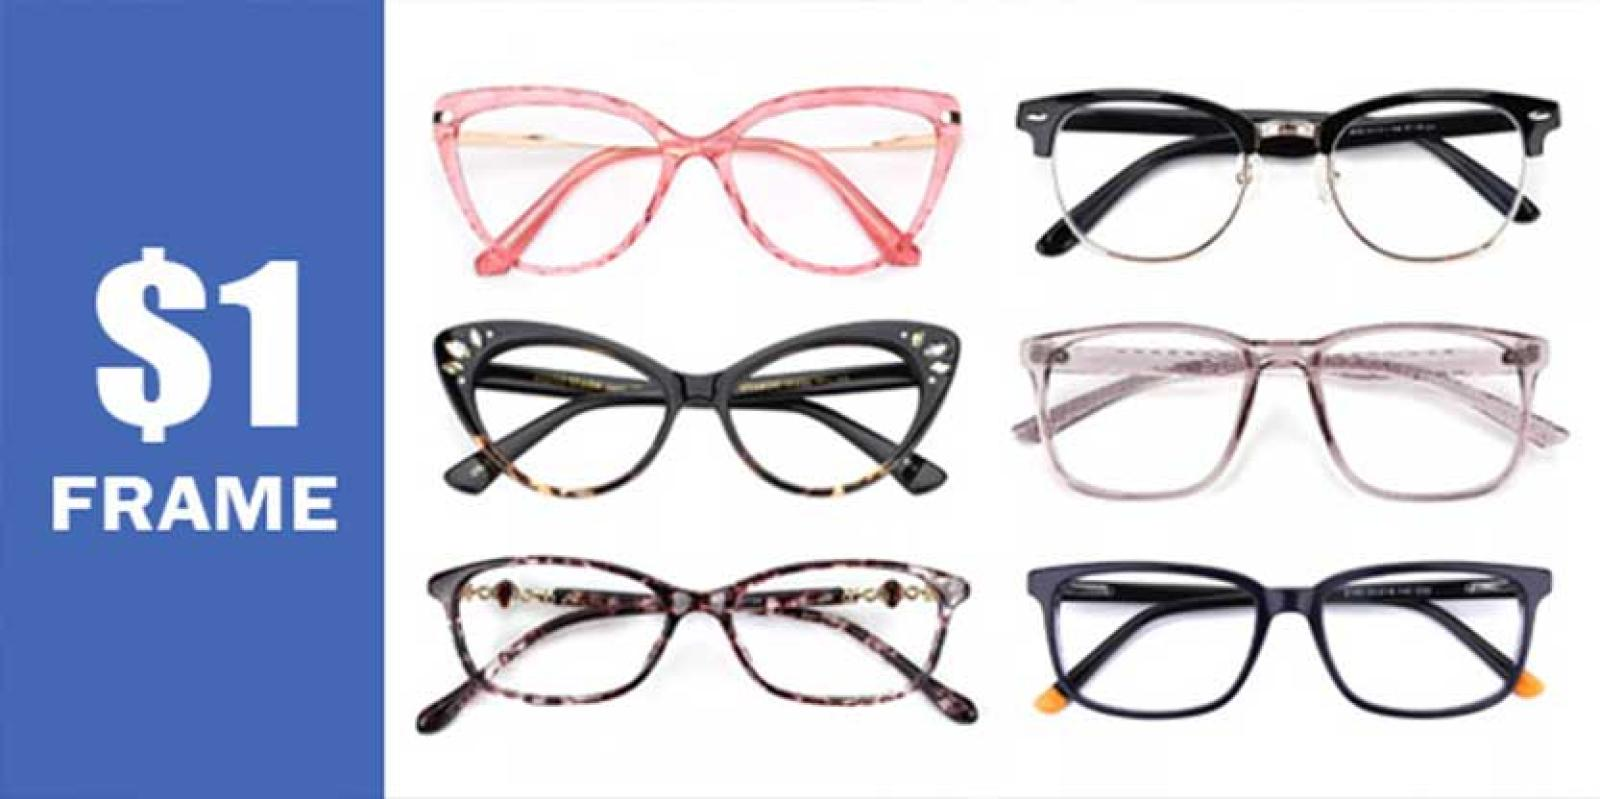 1.74 Digital Free Form Progressive UV+ Blue Blocker-Translucent---Eyeglasses-additional3